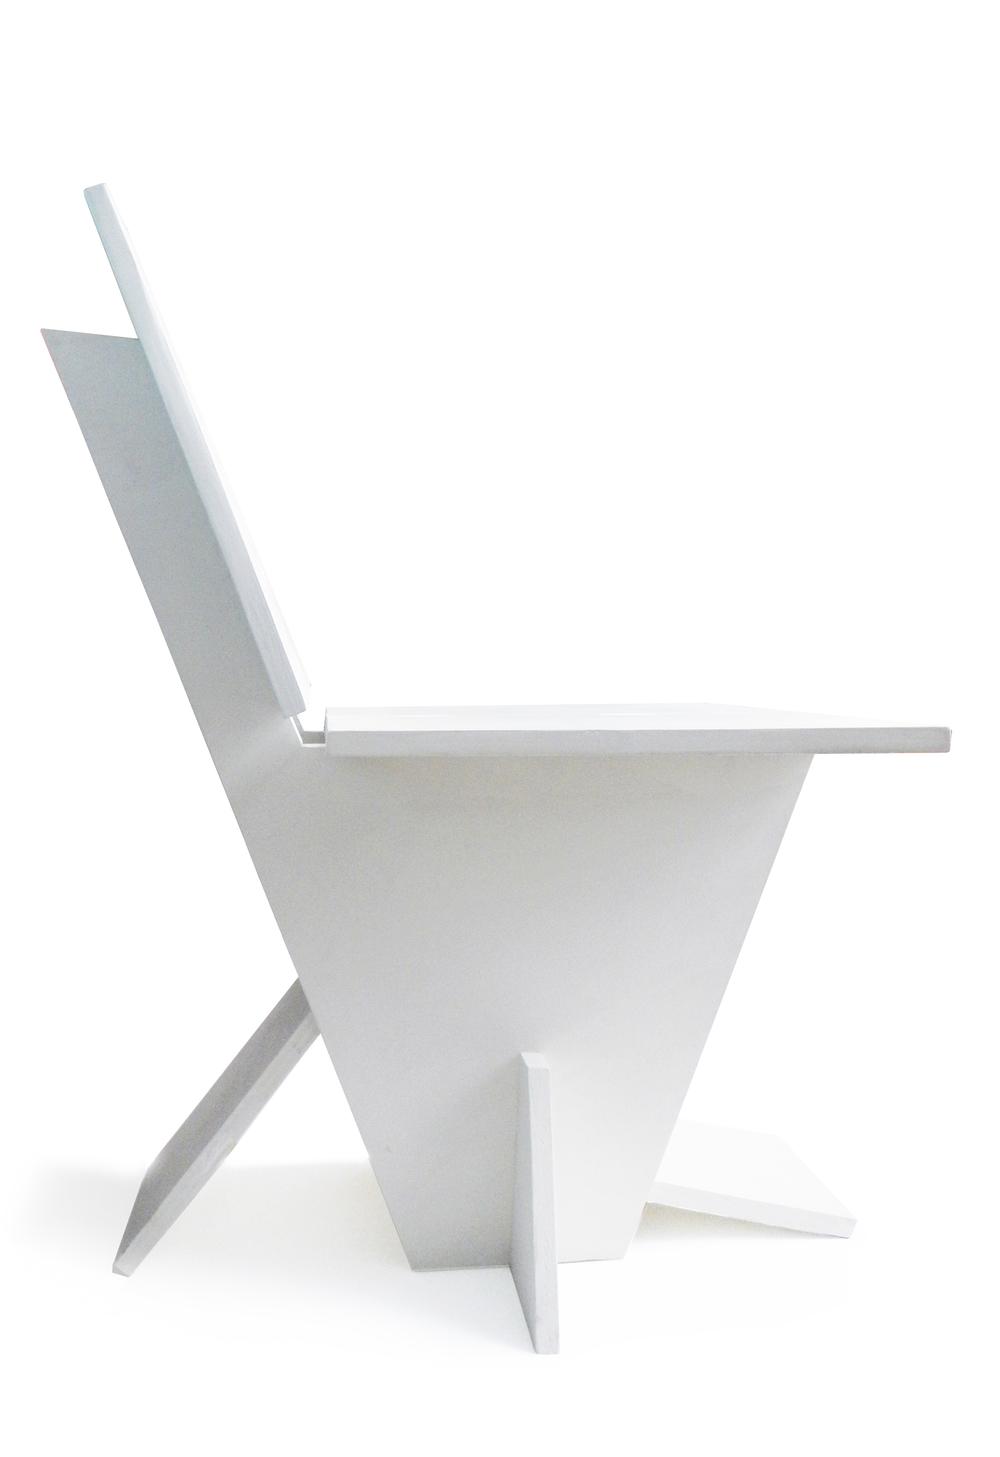 Glick_Ryan_Dining Chair 1_©